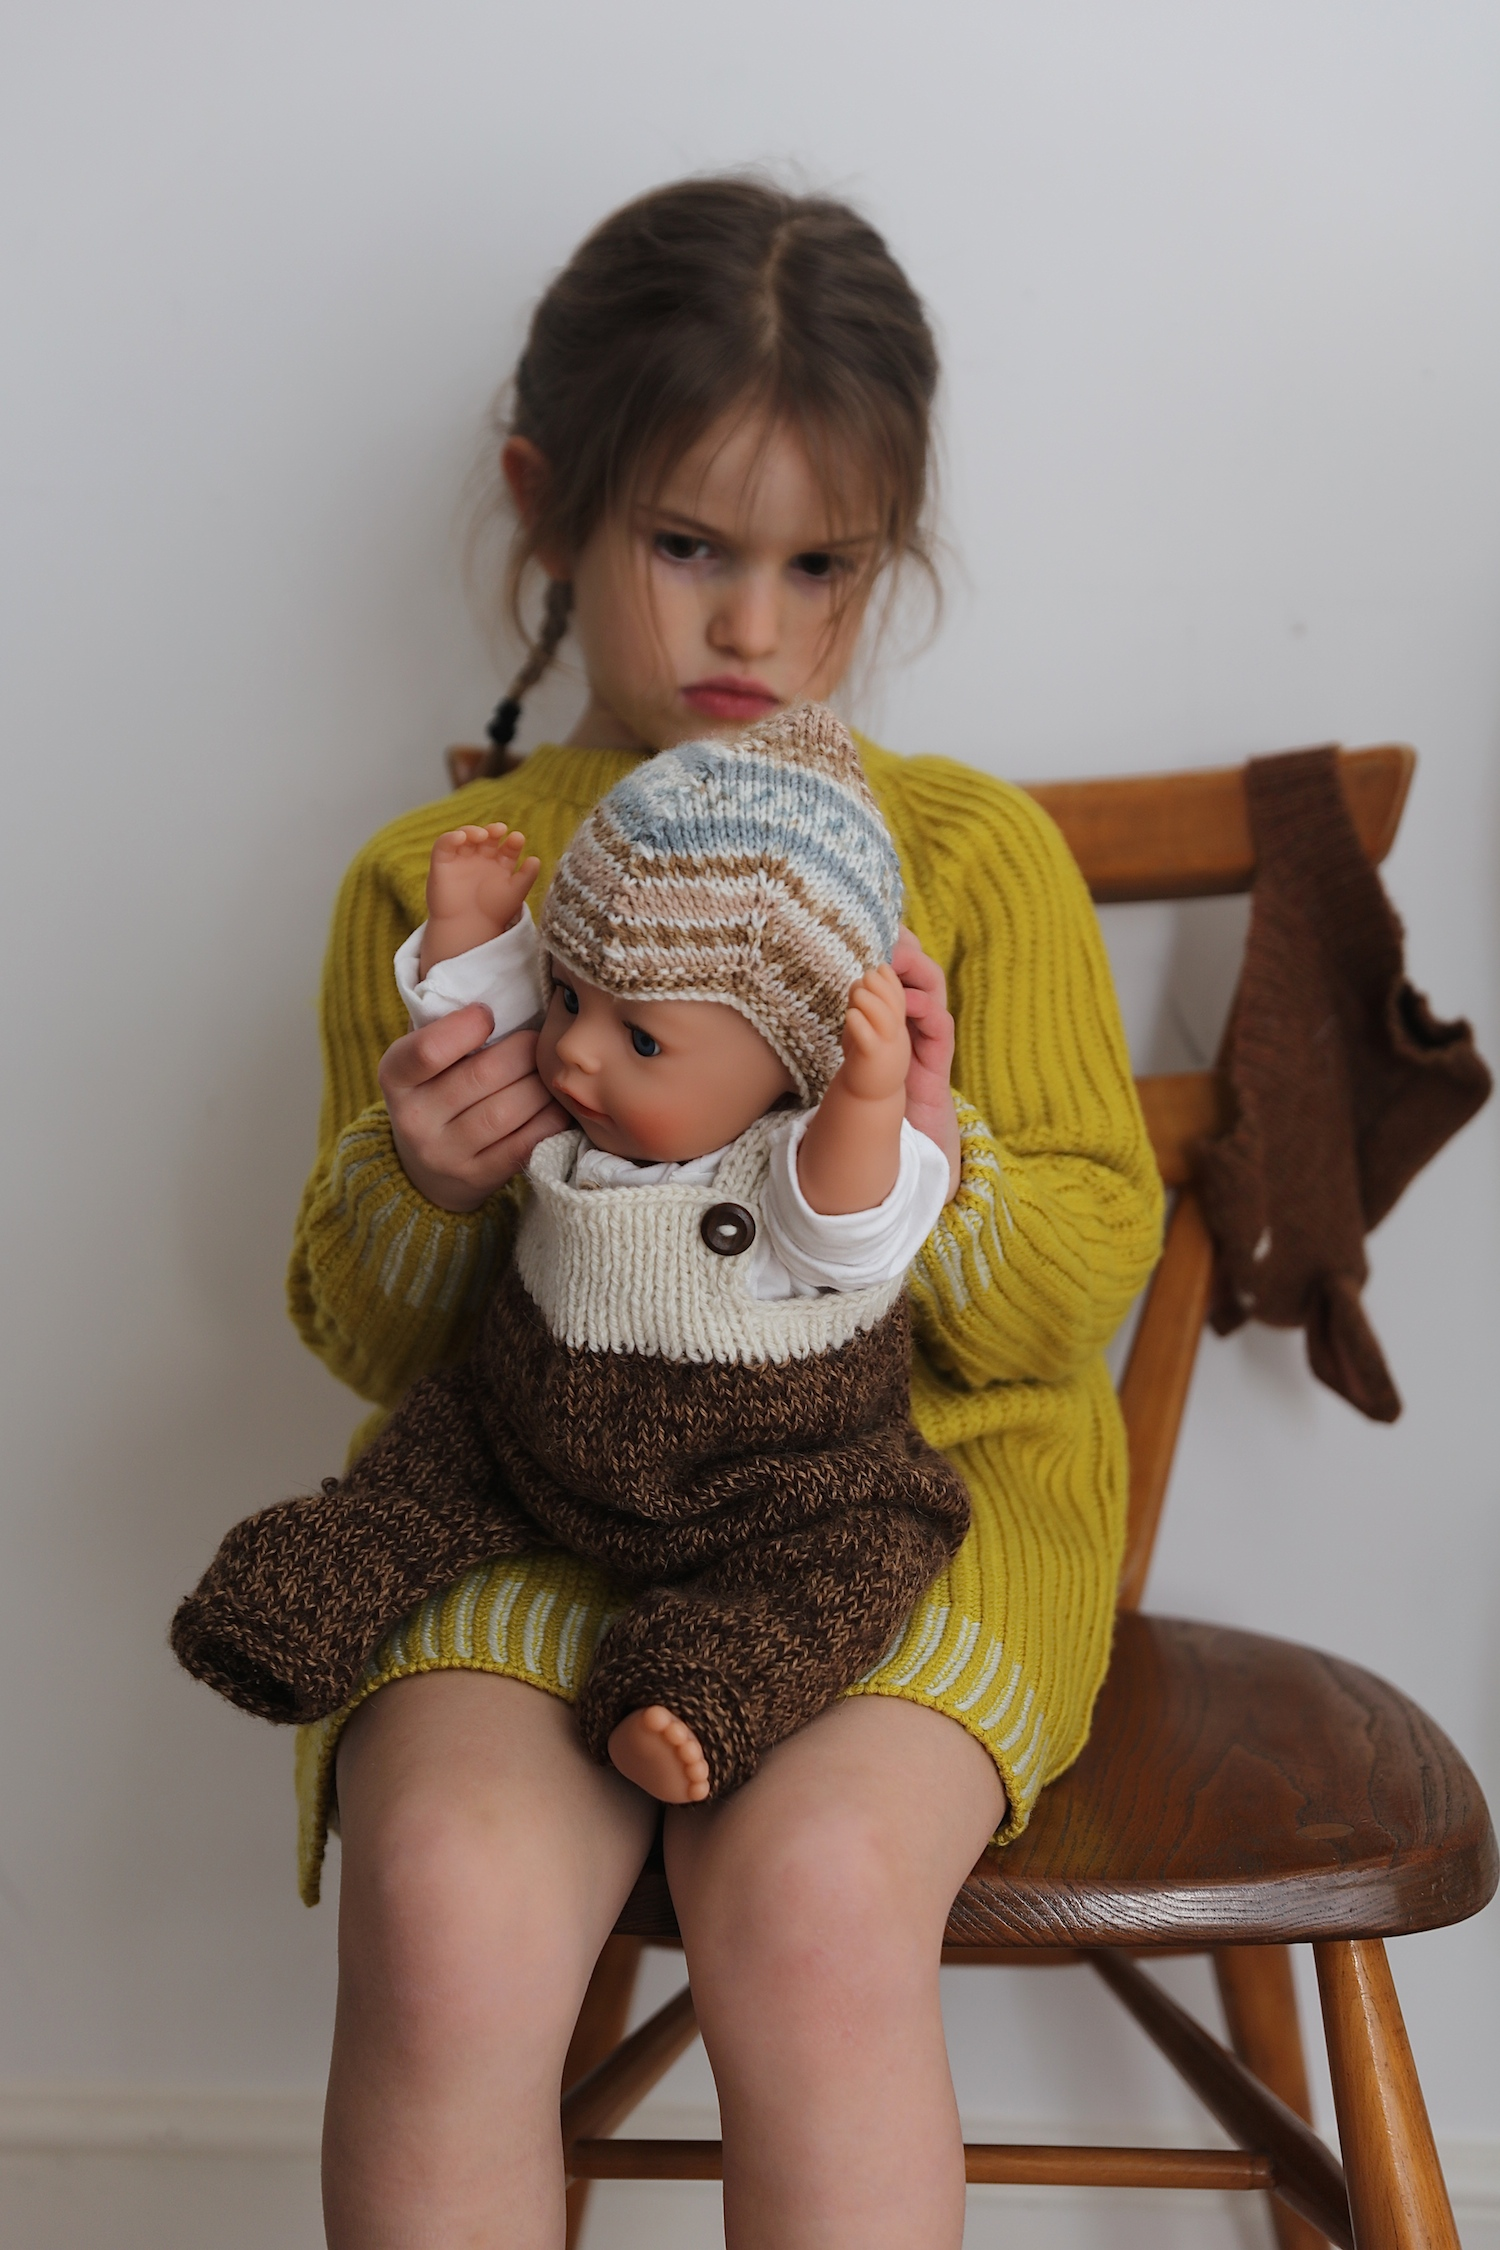 baby_doll_mabli_knits